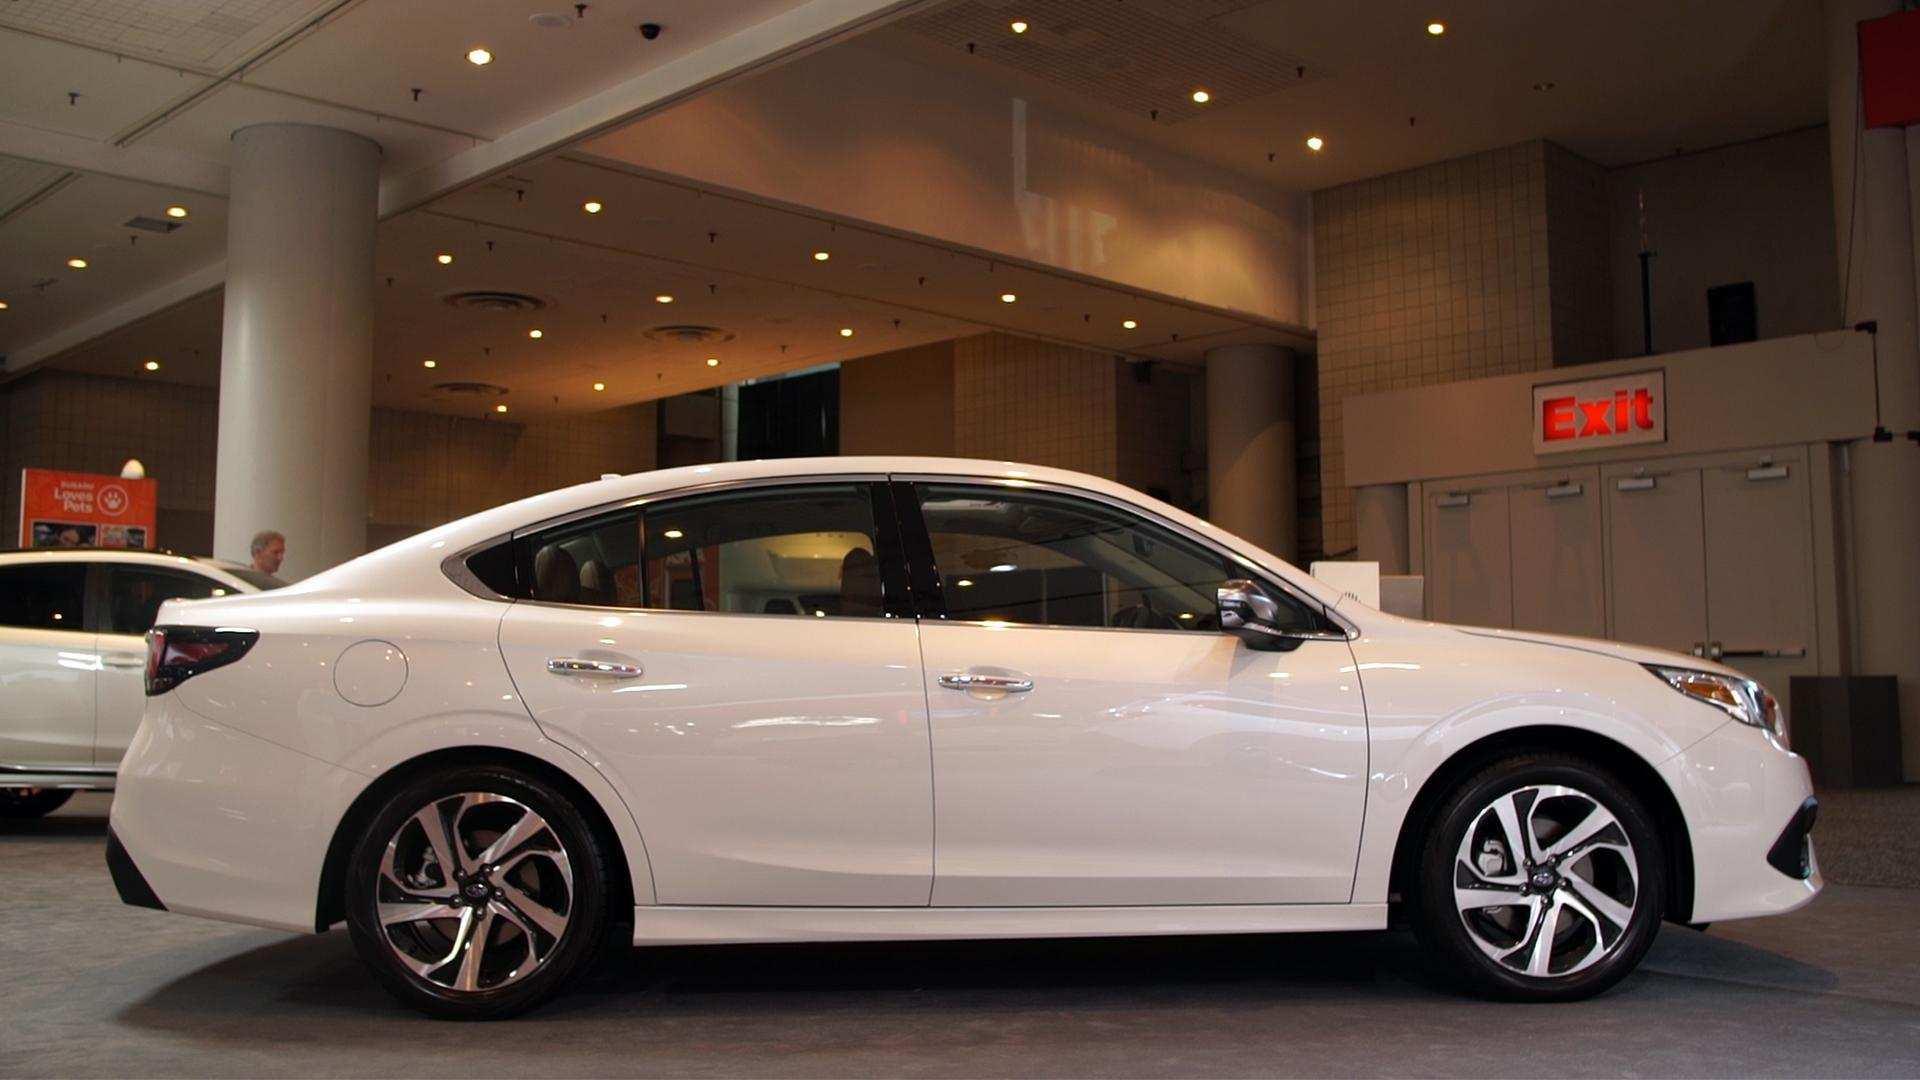 35 Best Review New Subaru Unveils 2019 Ascent Price And Release Date Price and Review with New Subaru Unveils 2019 Ascent Price And Release Date